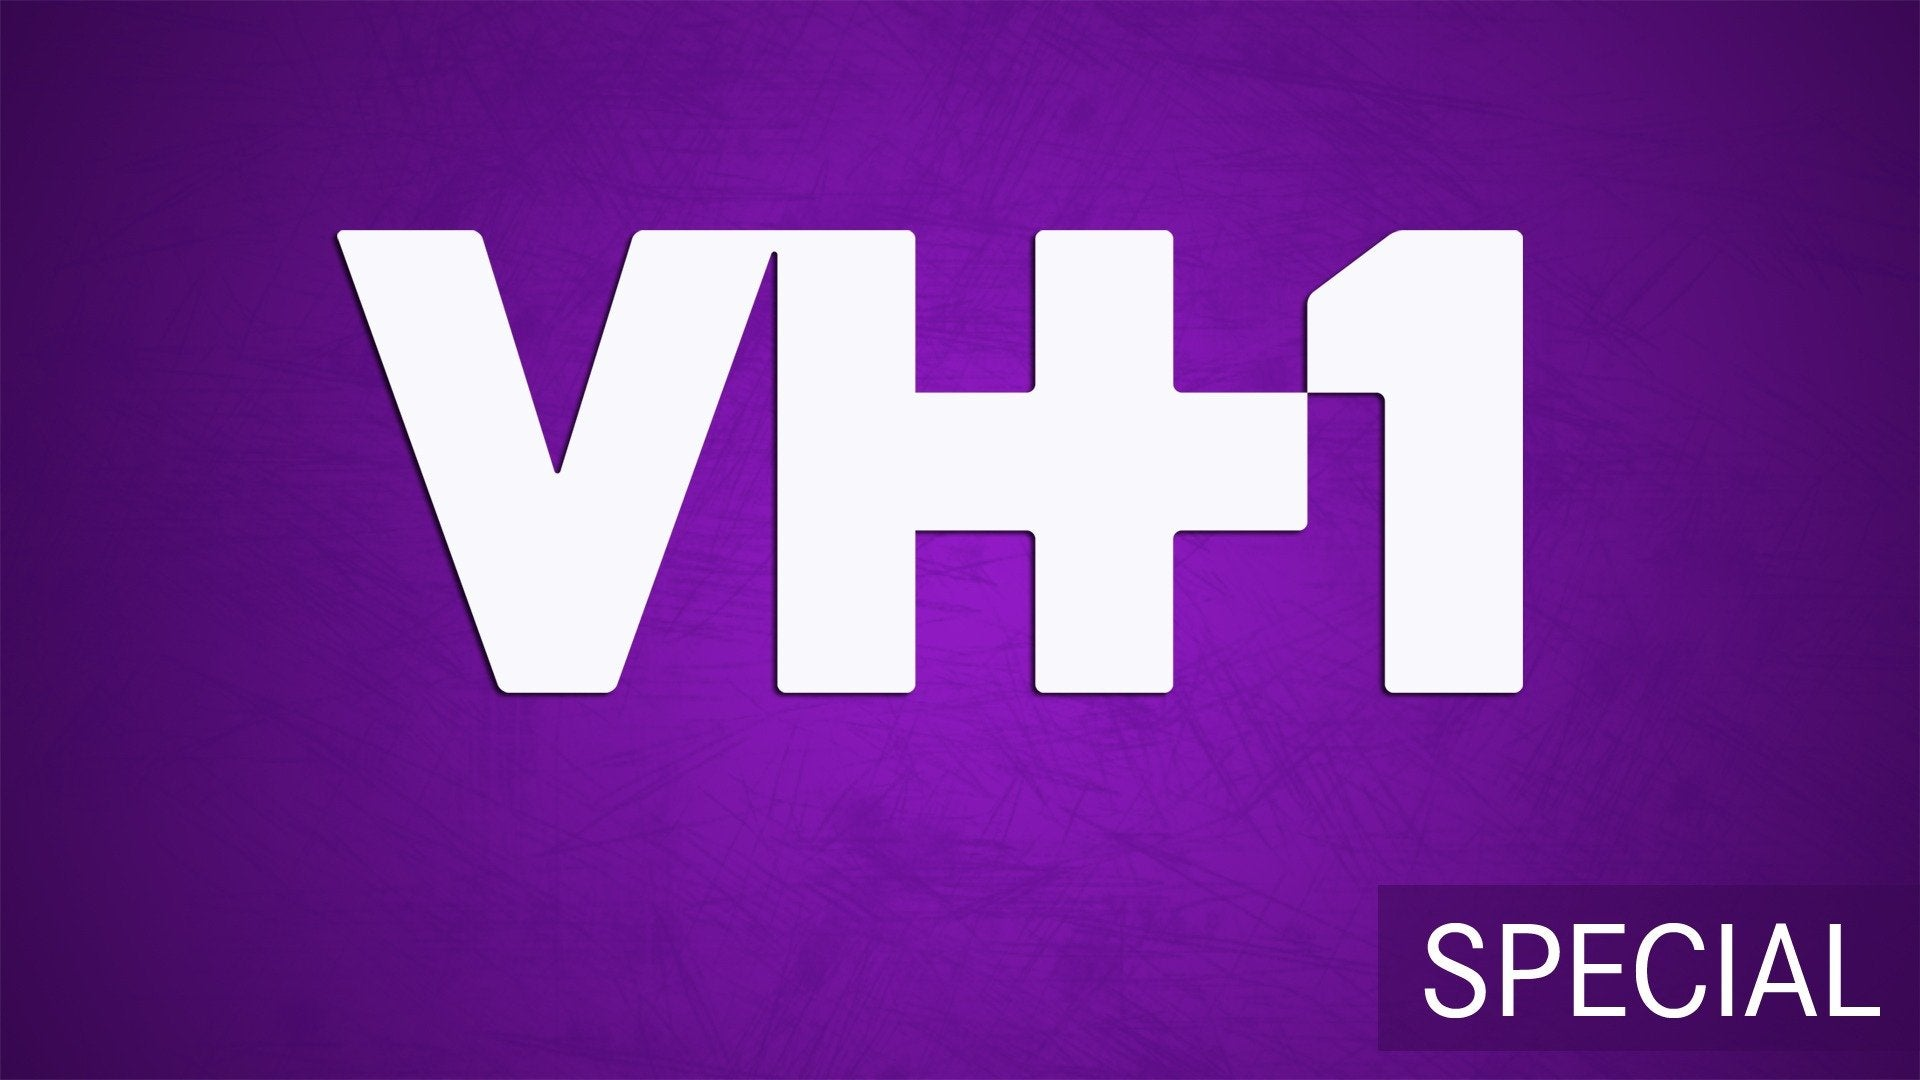 VH1 Special